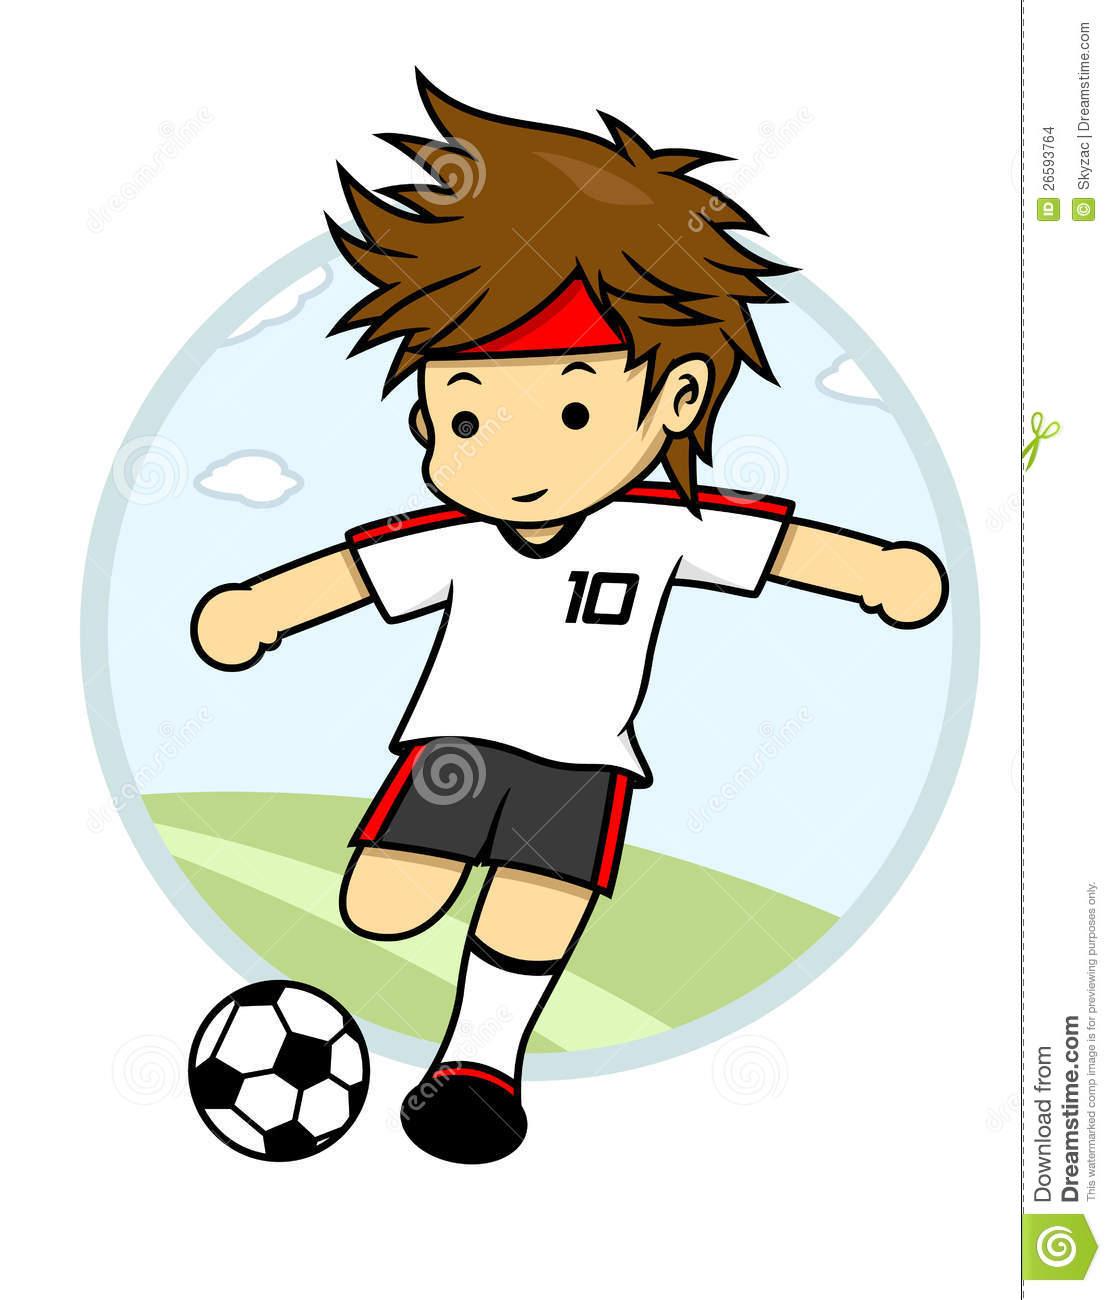 Kick ball clipart #7